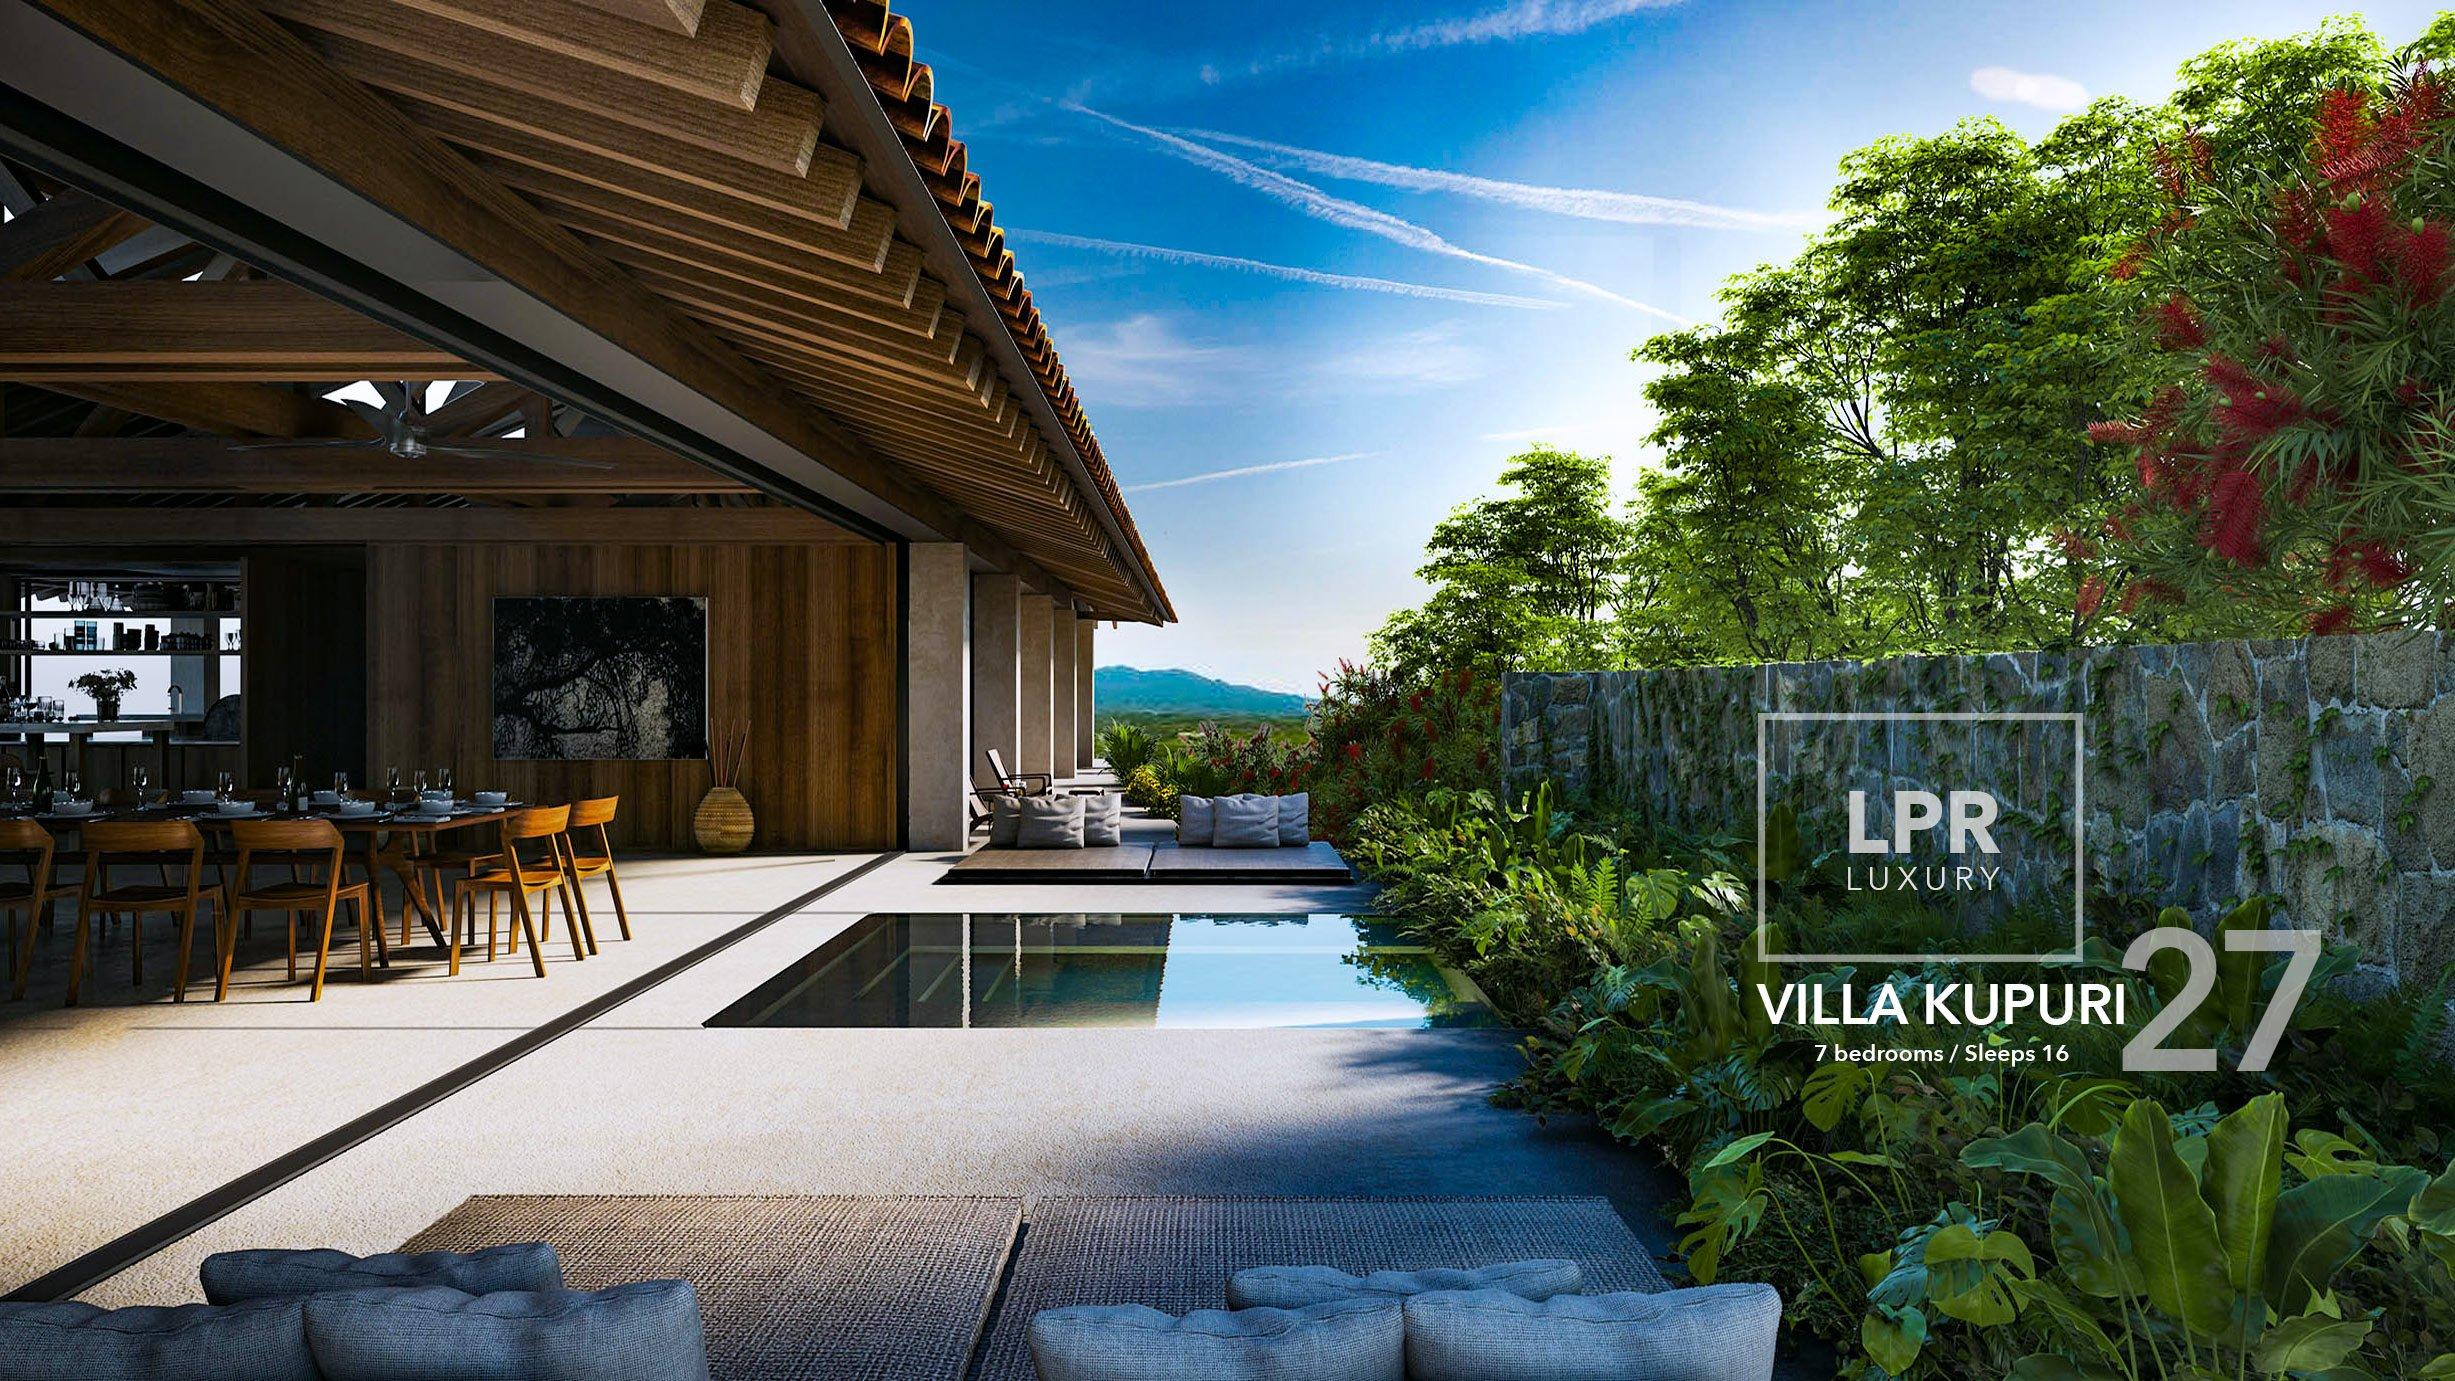 Villa Kupuri 27 at the Punta Mita Resort, Mexico